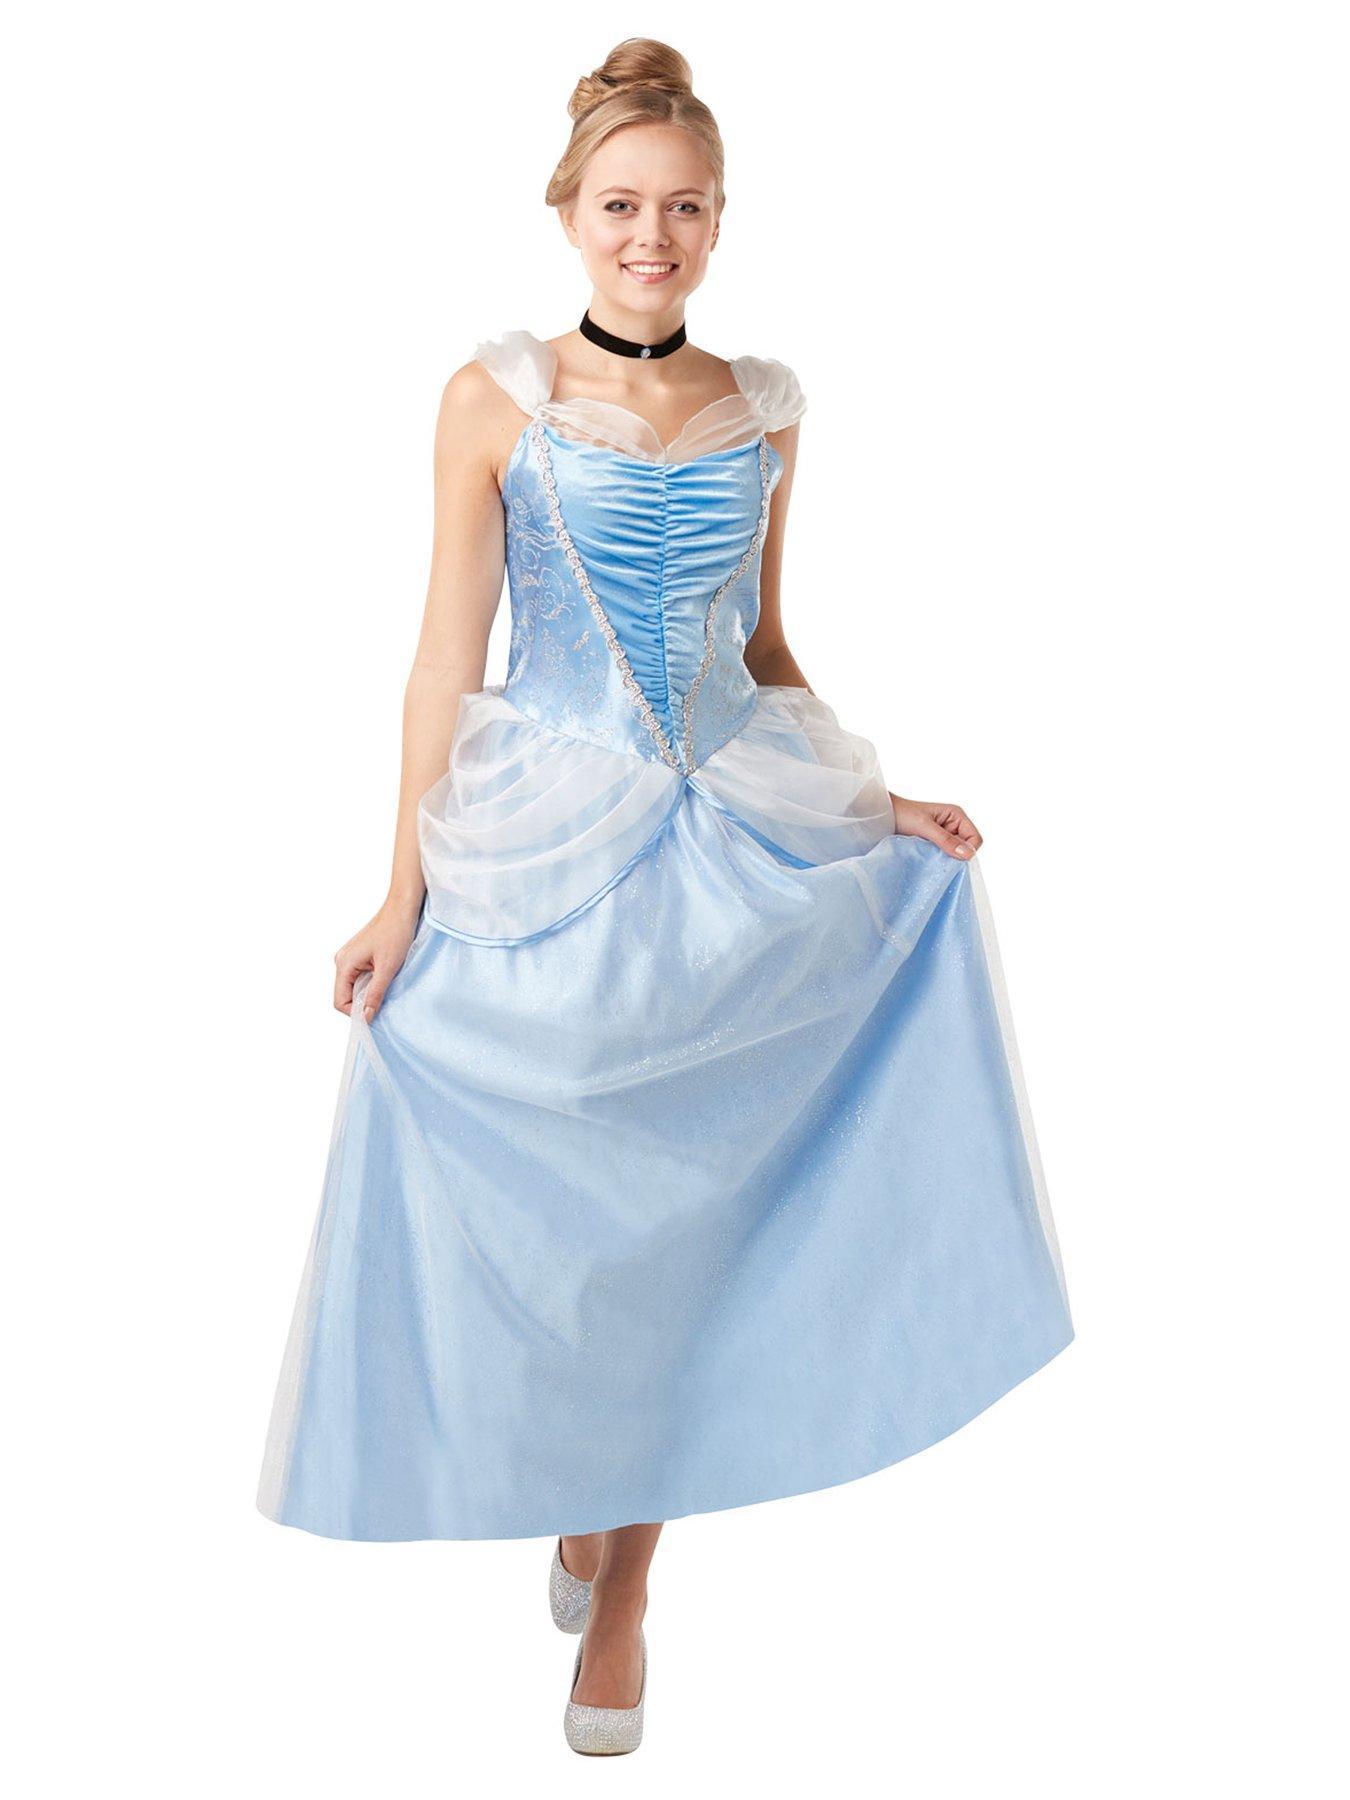 Disney Princess Ariel Dress Costume adult SIZE18,20,22,24,26,28 Light Pink//white